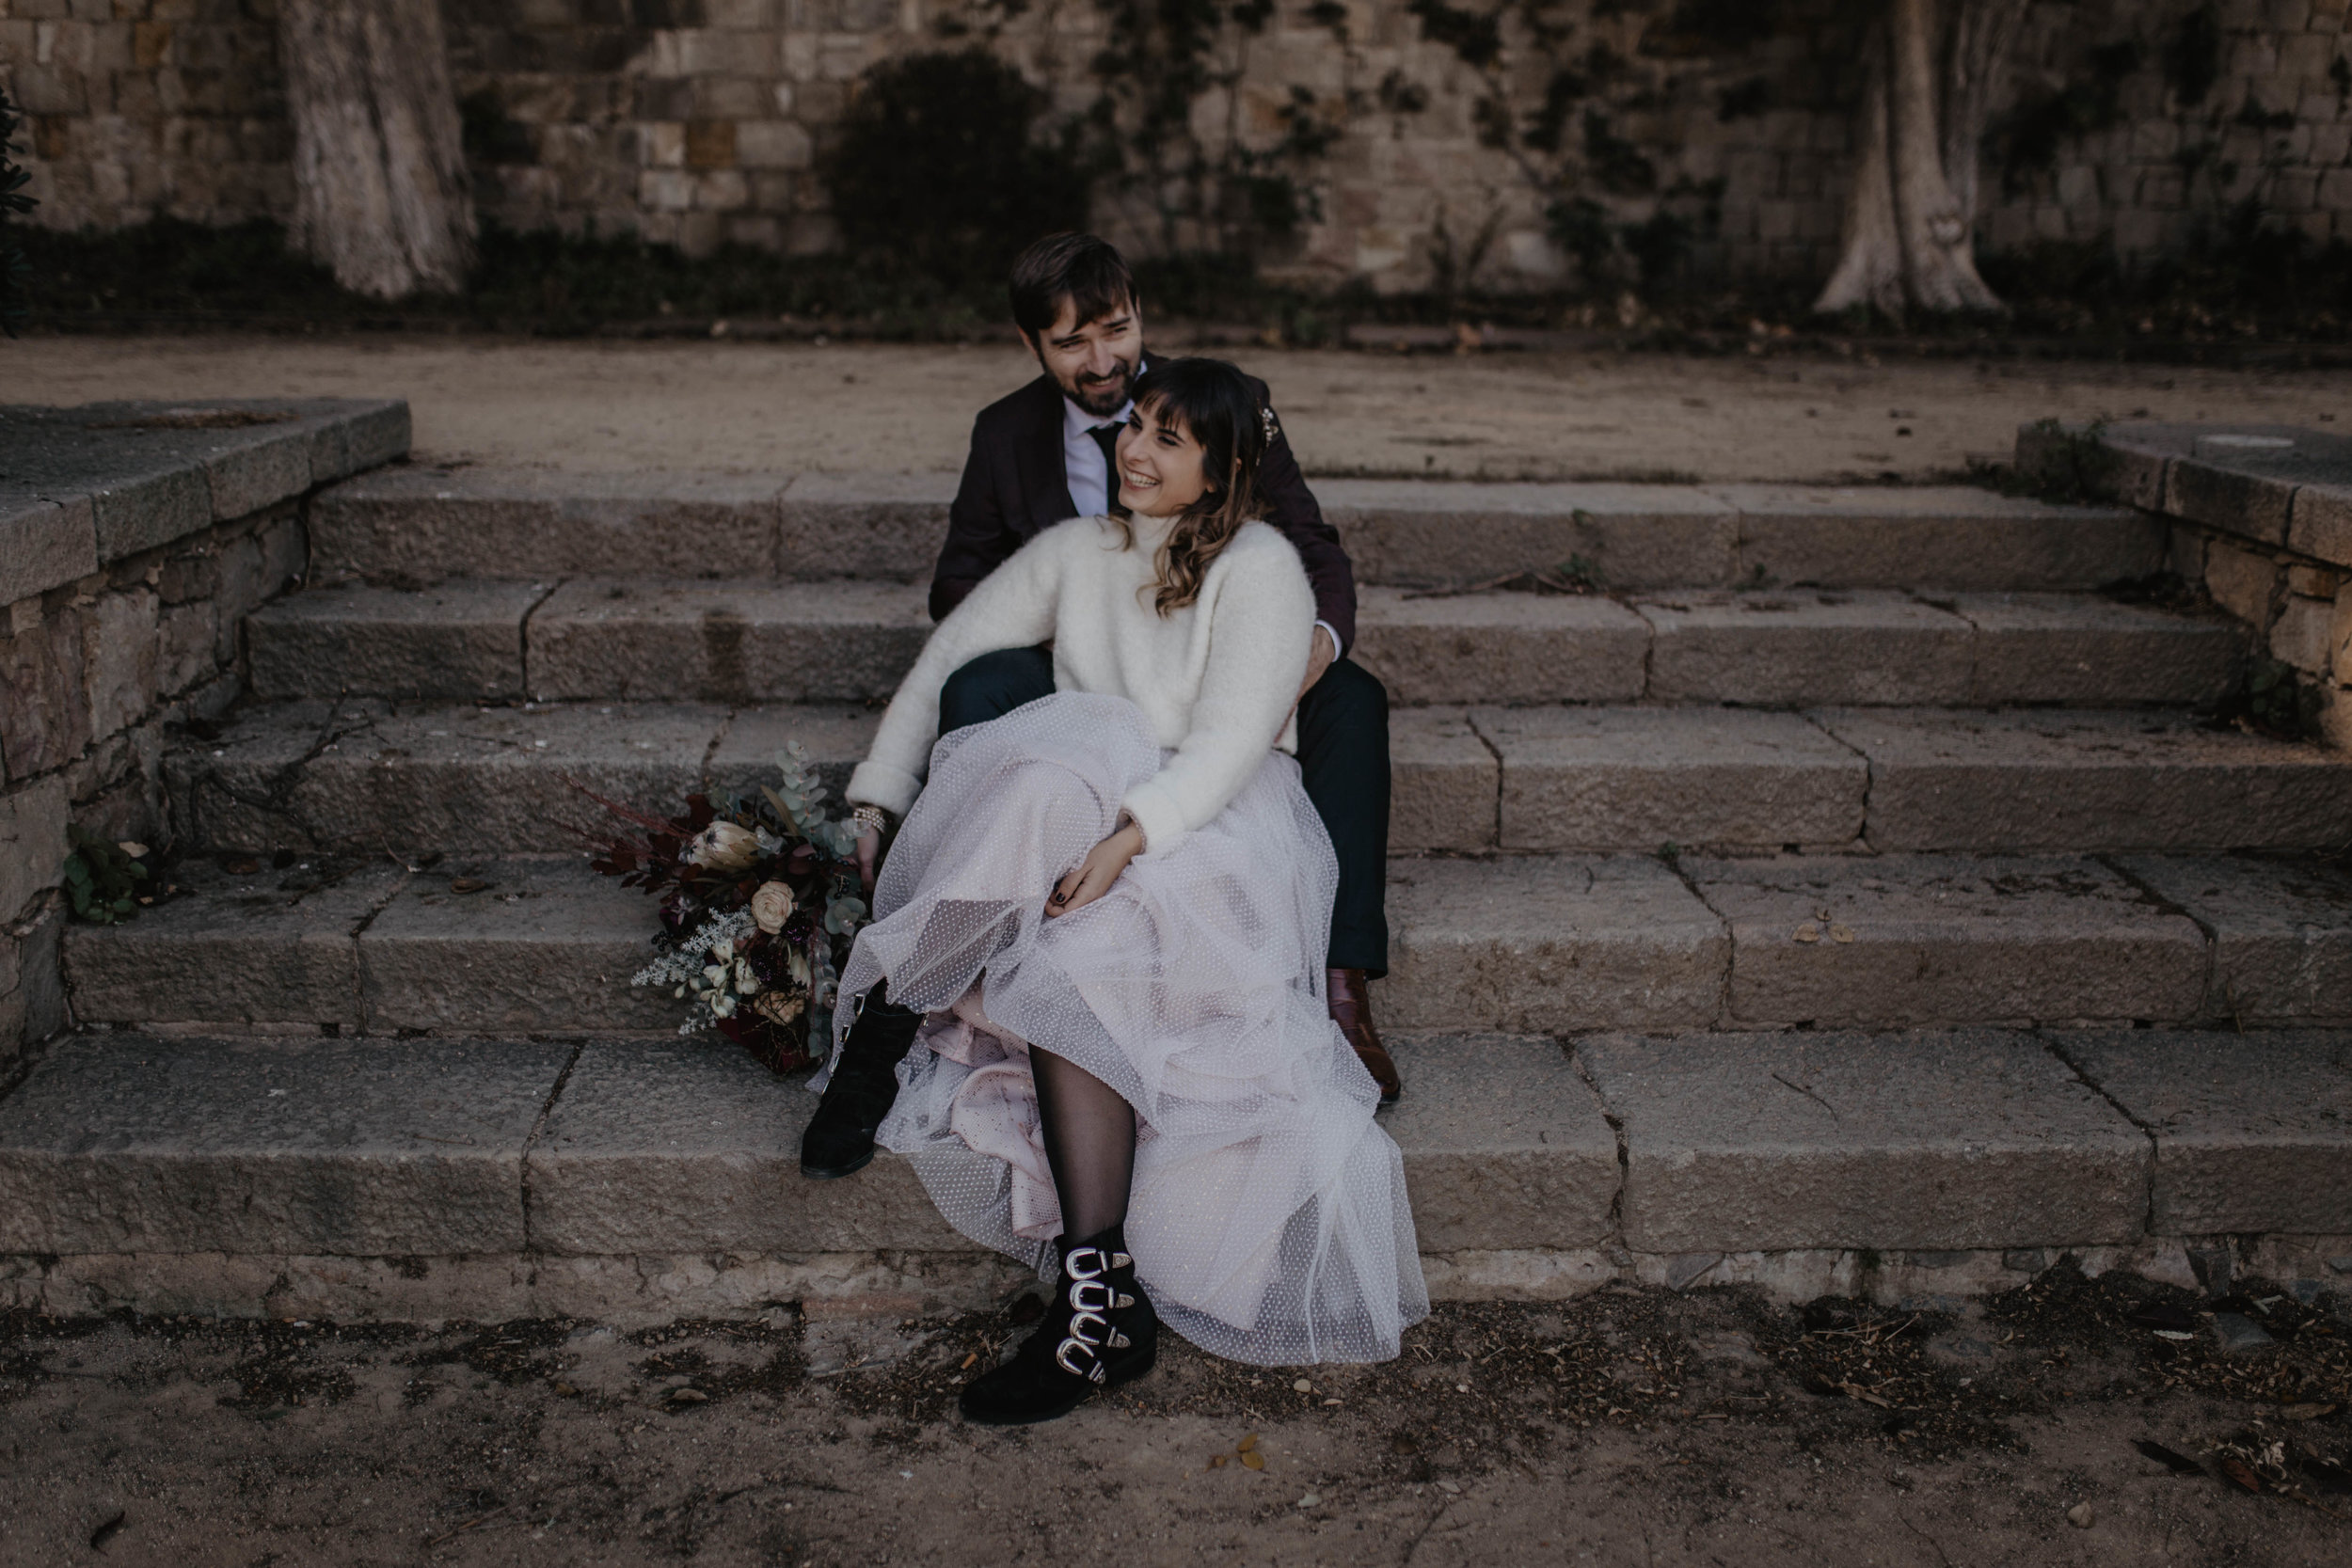 thenortherngirlphotography-photography-weddingphotography-couple-bodasconestilo-bodasenbarcelona-martadavid-351.jpg